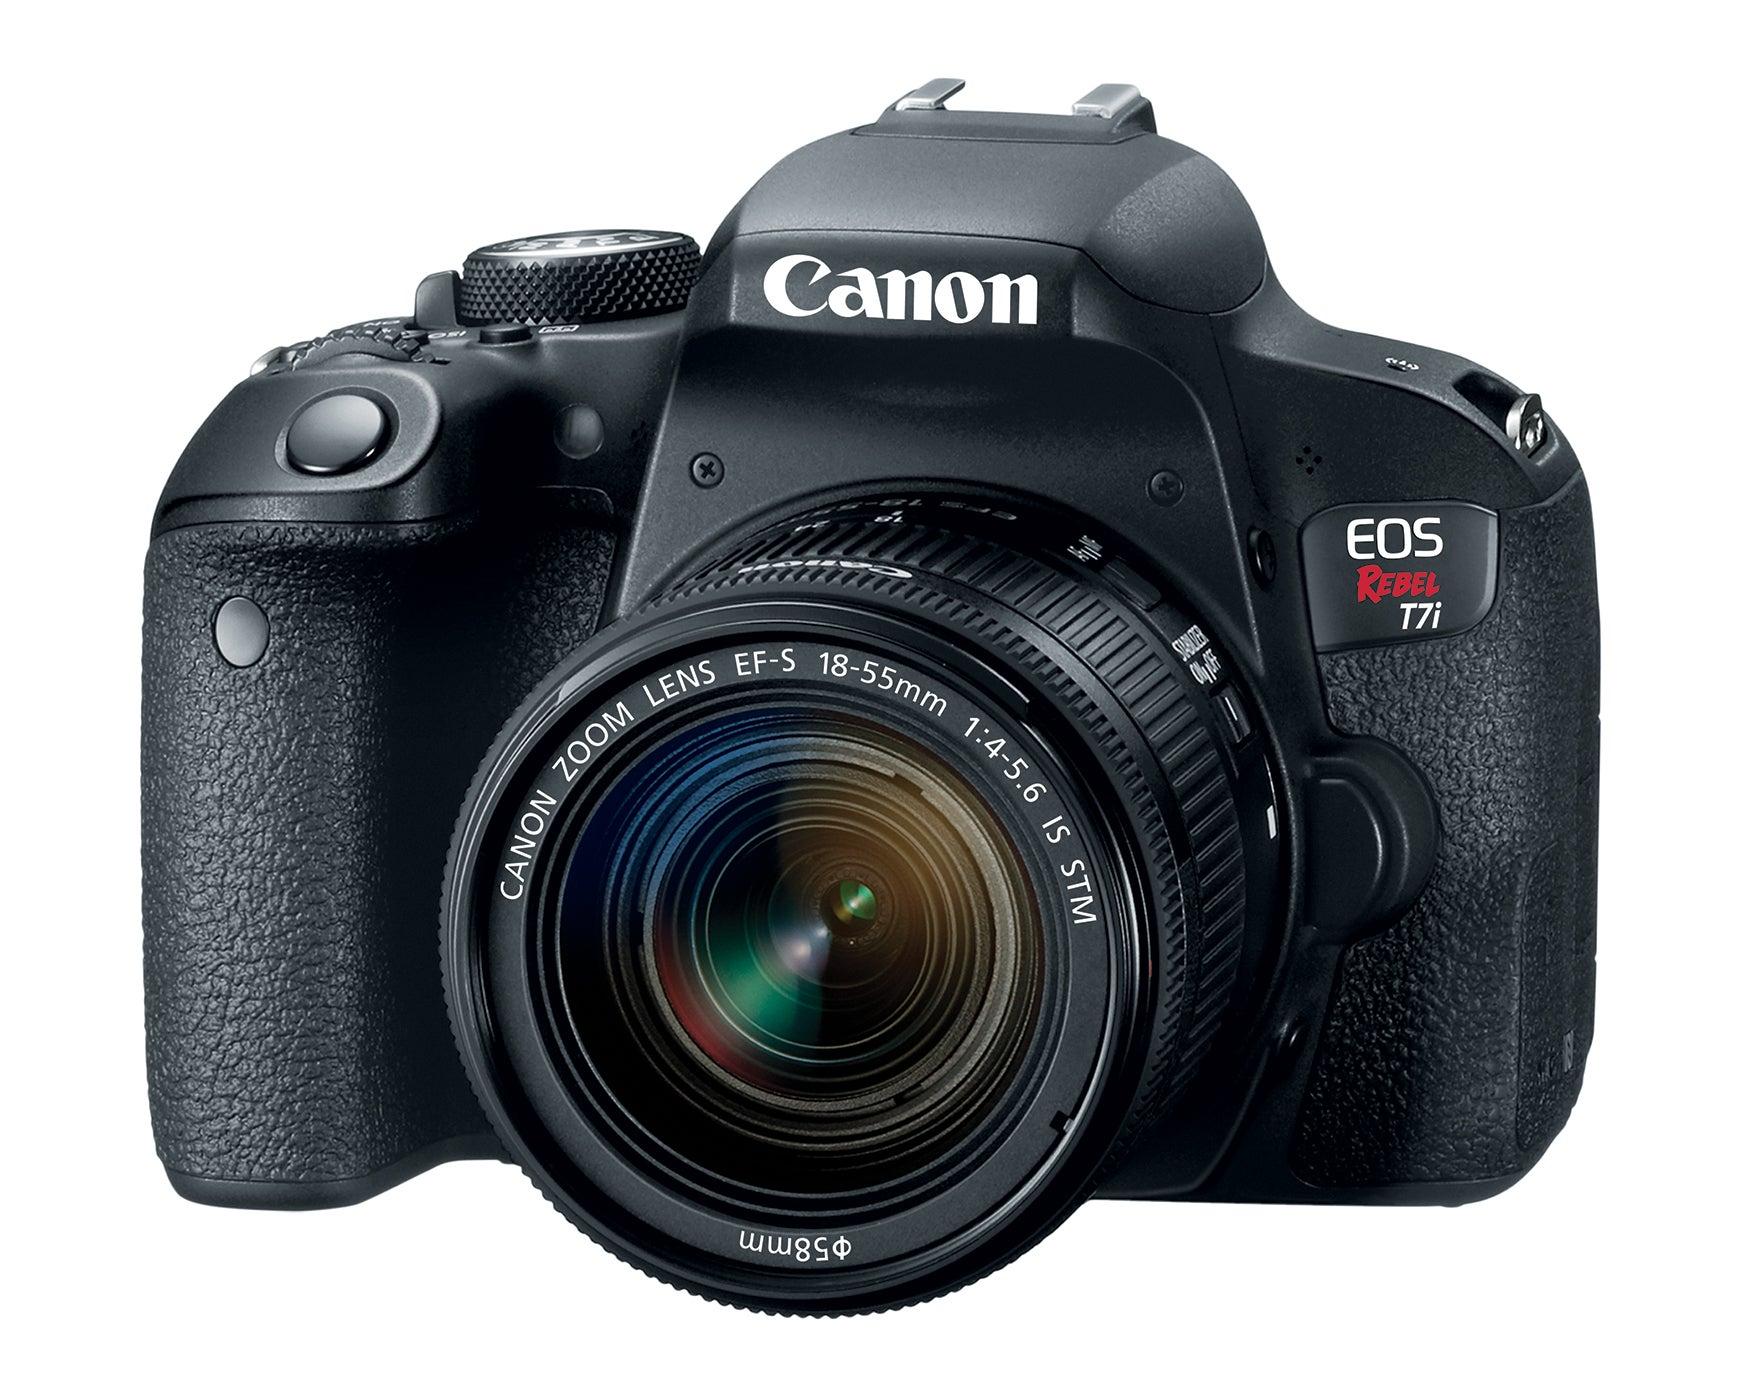 Canon EOS Rebel T7i DSLR